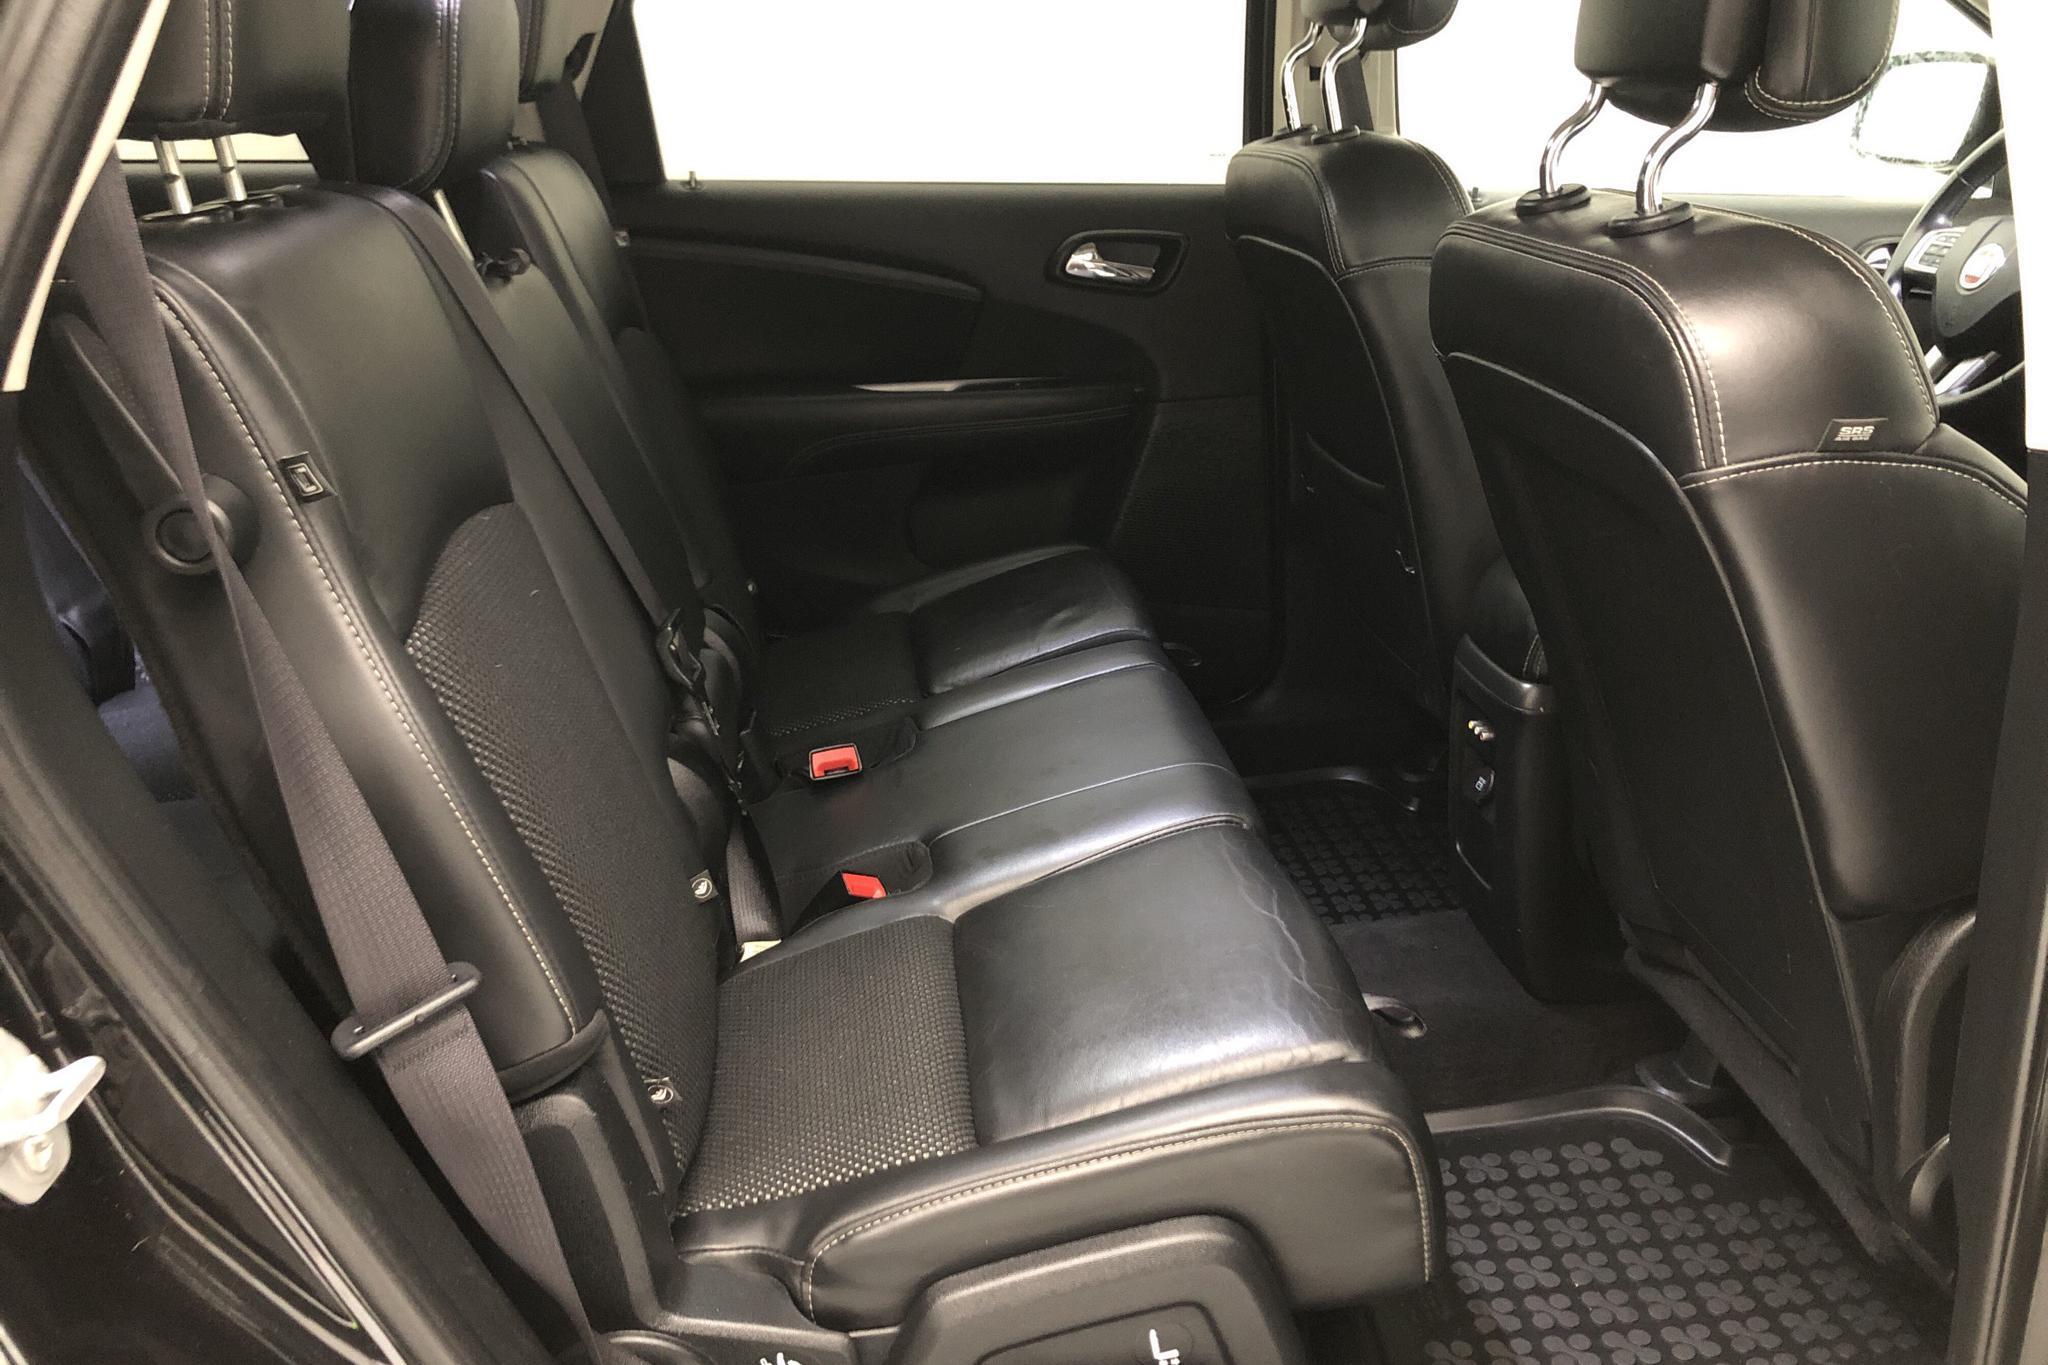 Fiat Freemont 2.0 Multijet AWD (170hk) - 144 440 km - Automatic - black - 2015